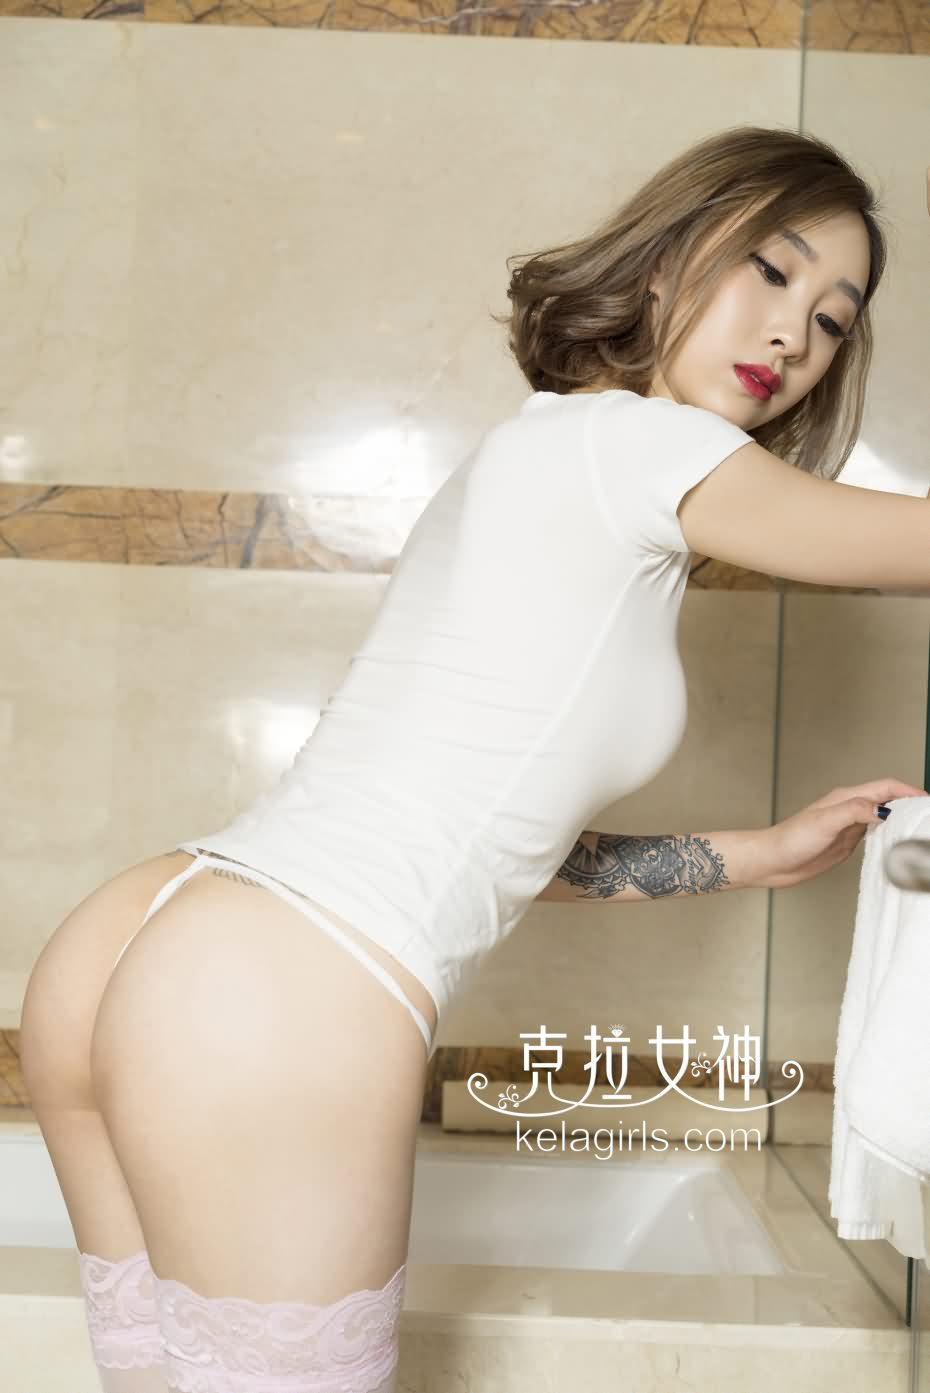 [Kelagirls克拉女神] 珍宝鉴定师 张茜  2017.08.10[28P-448MB]